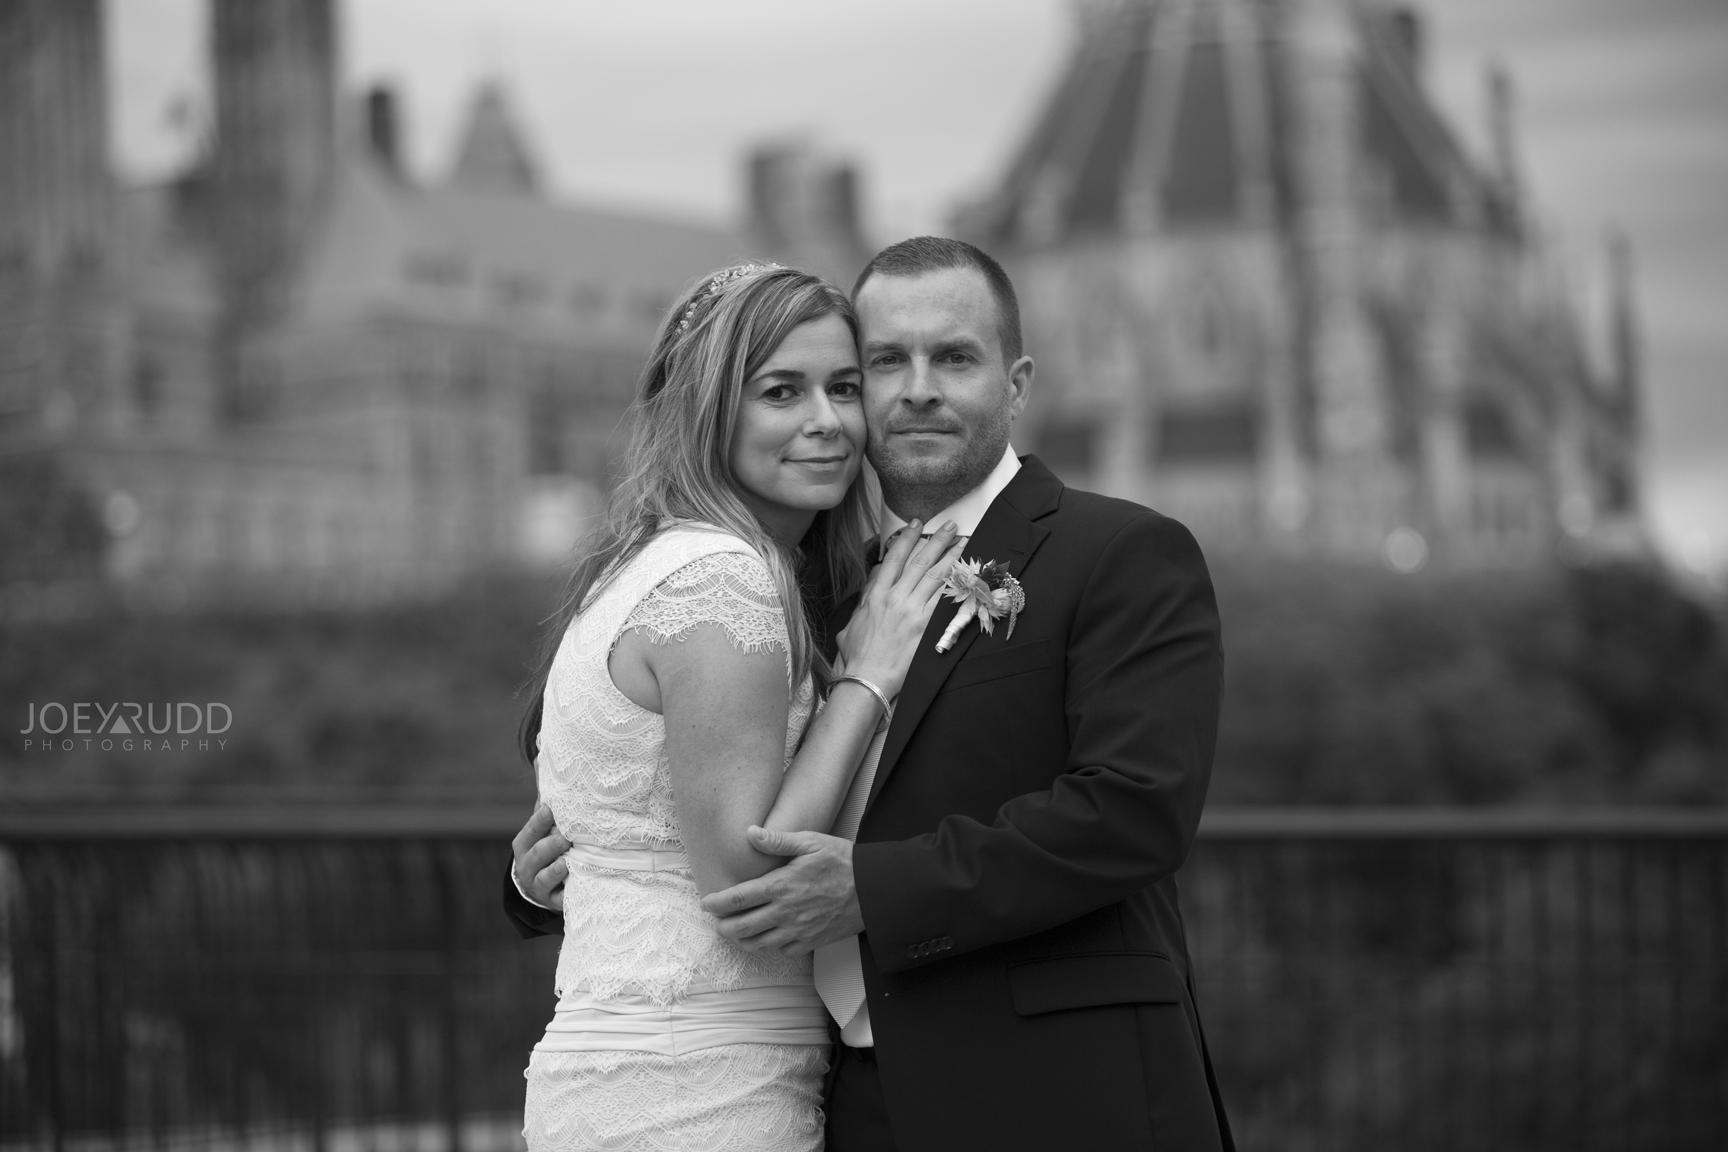 Elopement Wedding by Ottawa Wedding Photographer Joey Rudd Photography Majors Hill Black and White